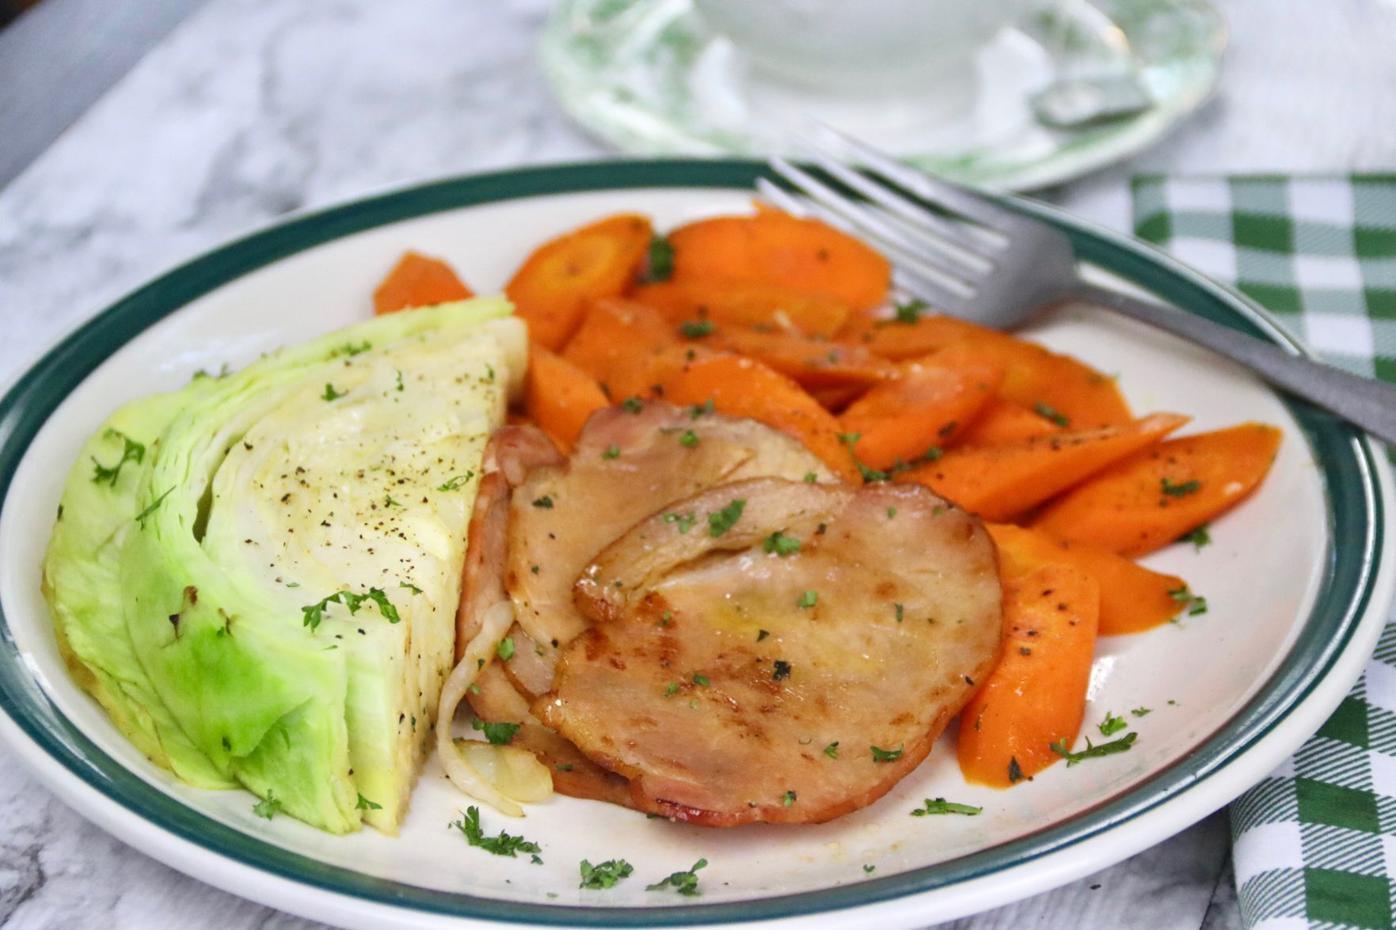 Irish Bacon, Cabbage and Carrots